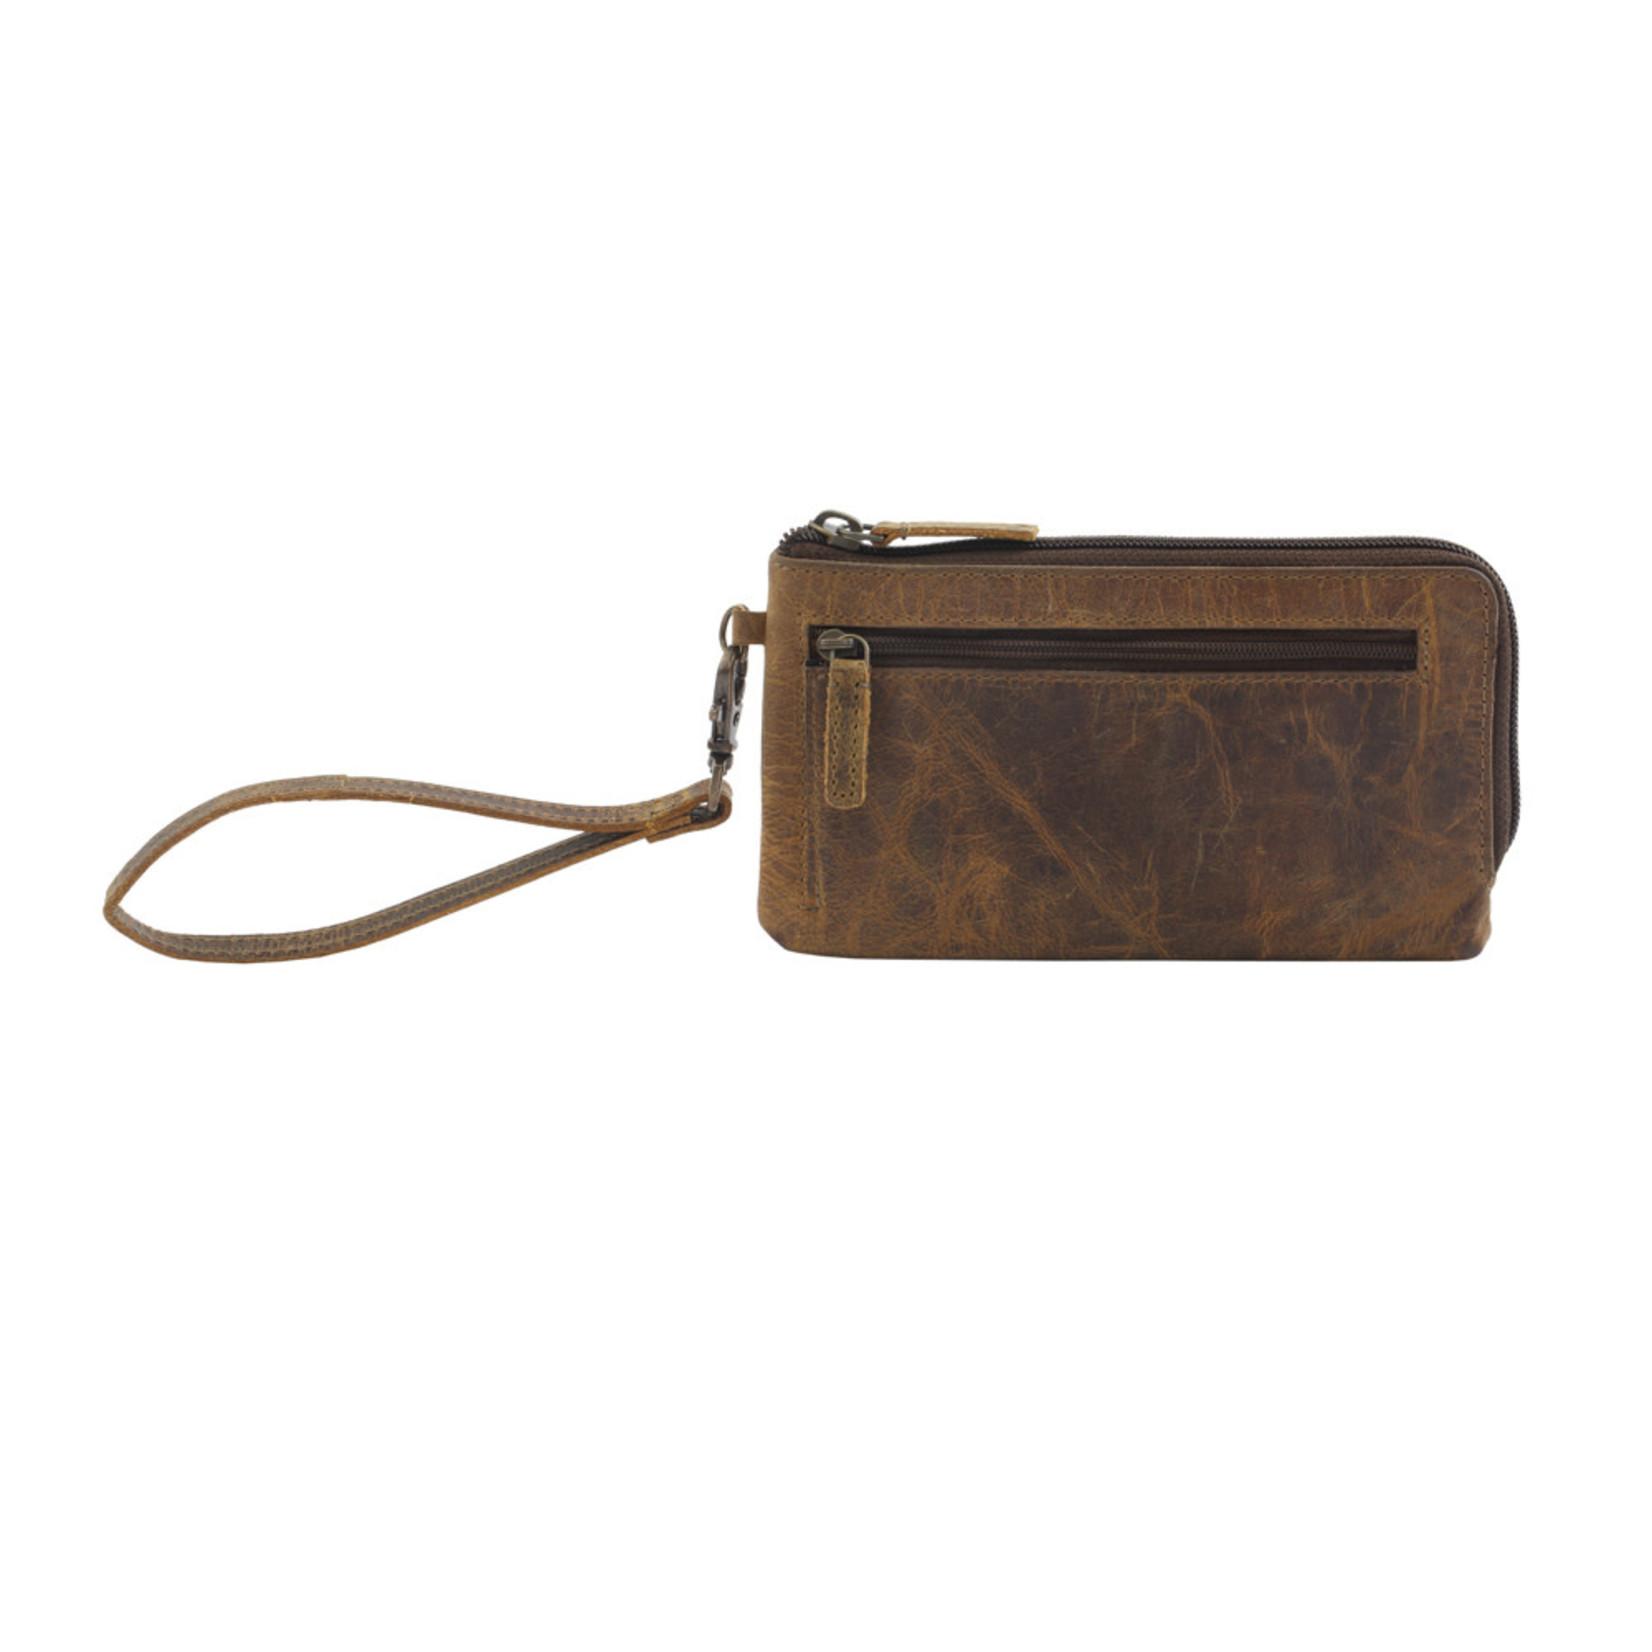 Myra Bags S-2696 Super Tan Leather Wallet/Wristlet